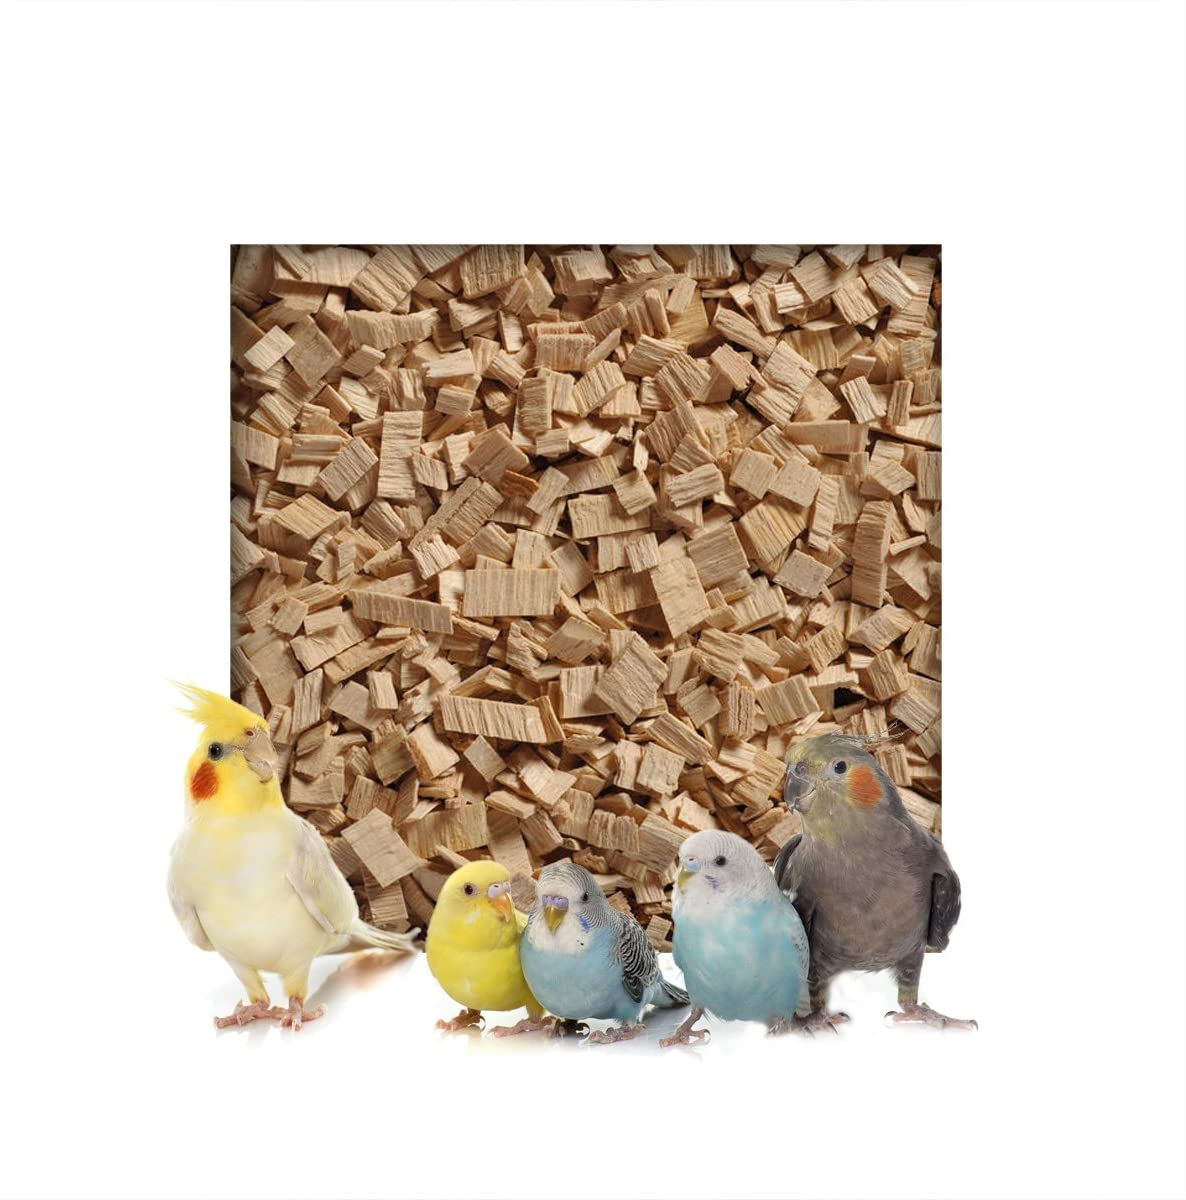 Buchenholzgranulat-naturbelassenes-Einstreu